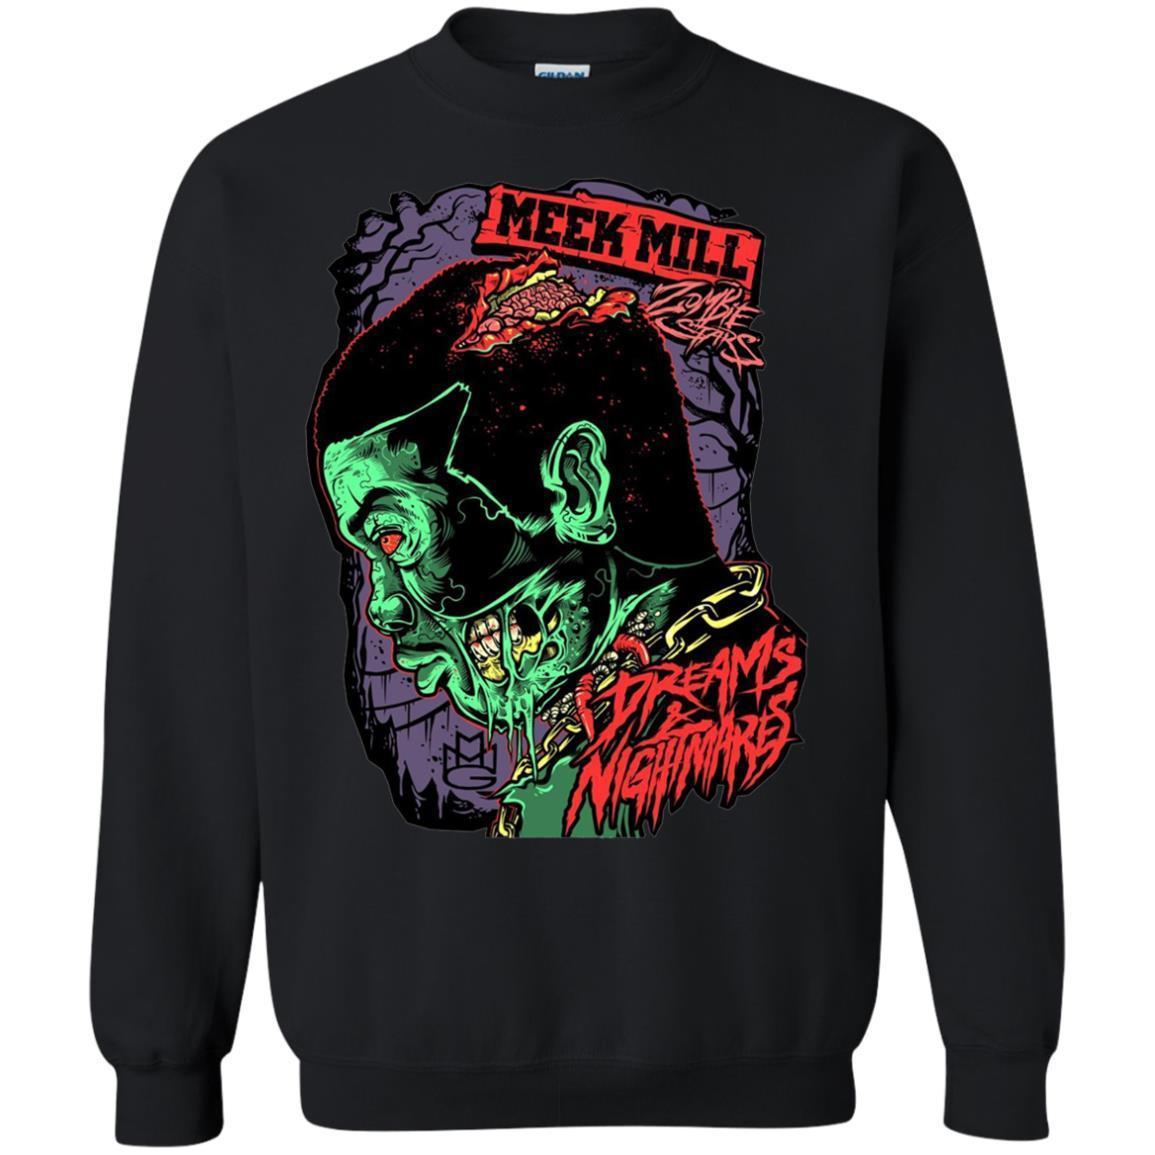 Meek Mill Zombie Tee Shirt Halloween – Crewneck Pullover Sweatshirt